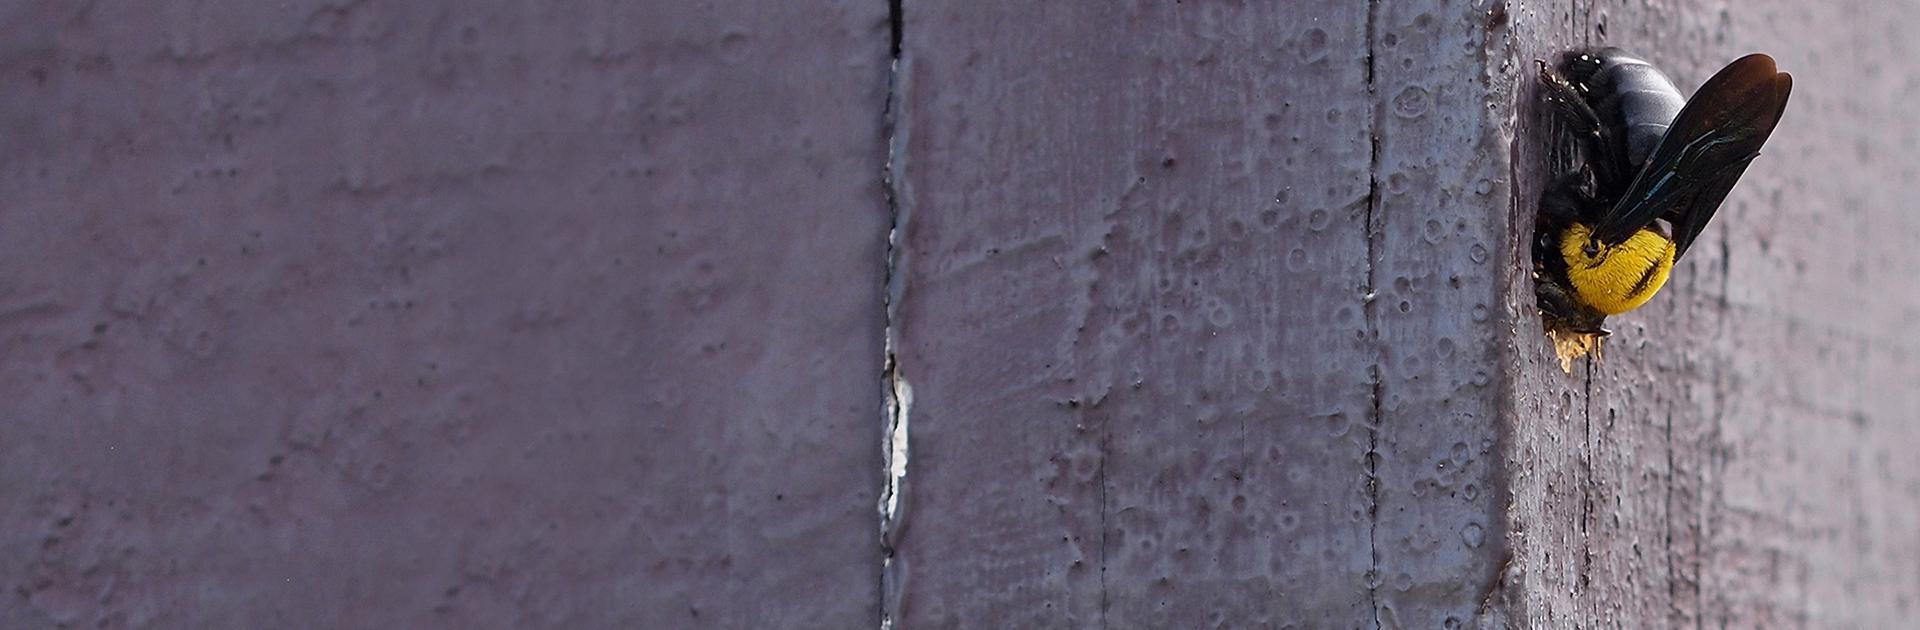 carpenter bee boring into wooden fence